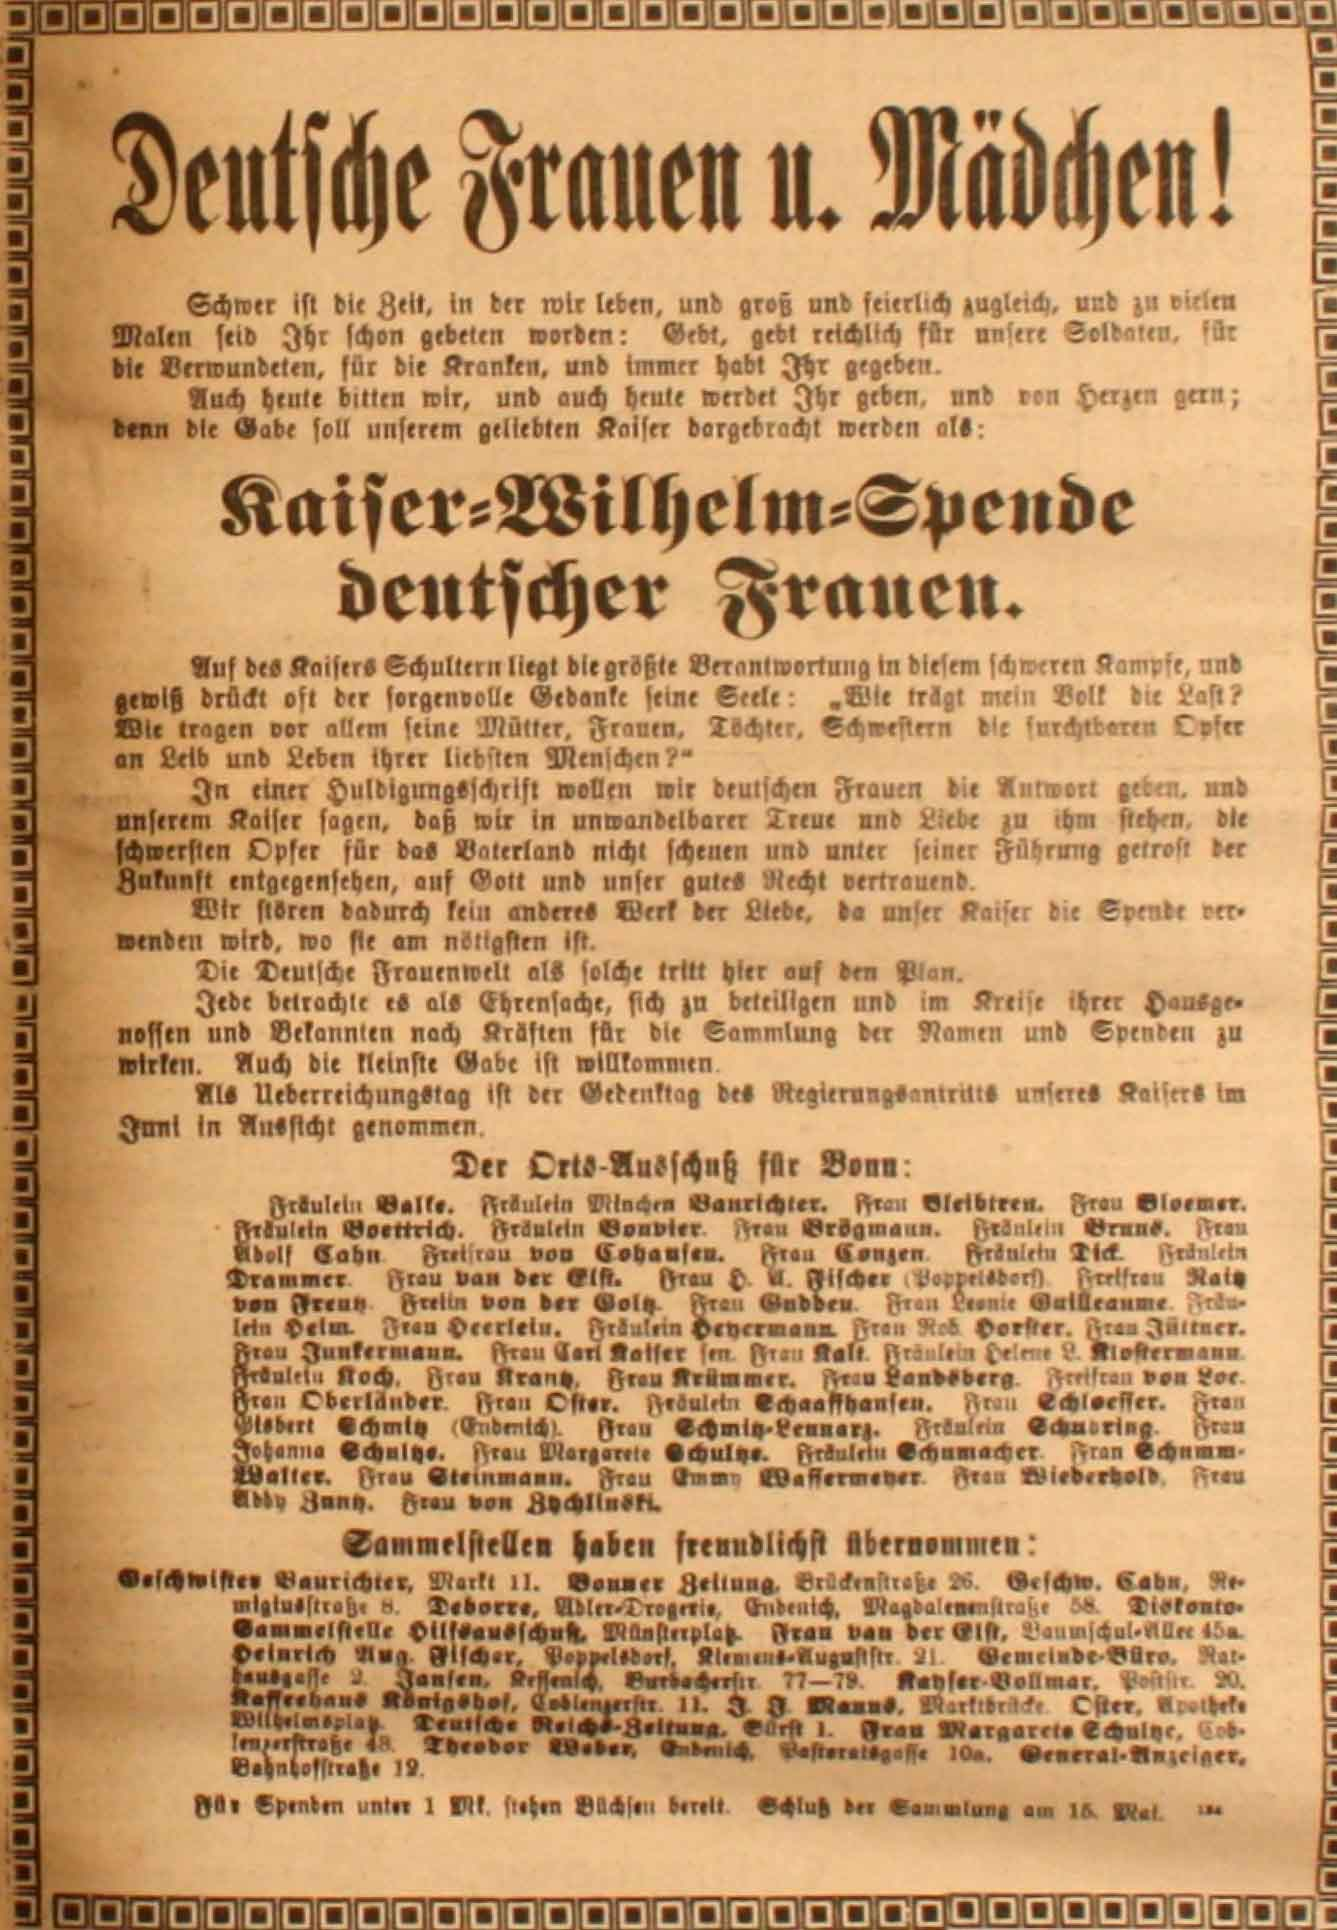 gesetze kurtaxe schleswig holstein